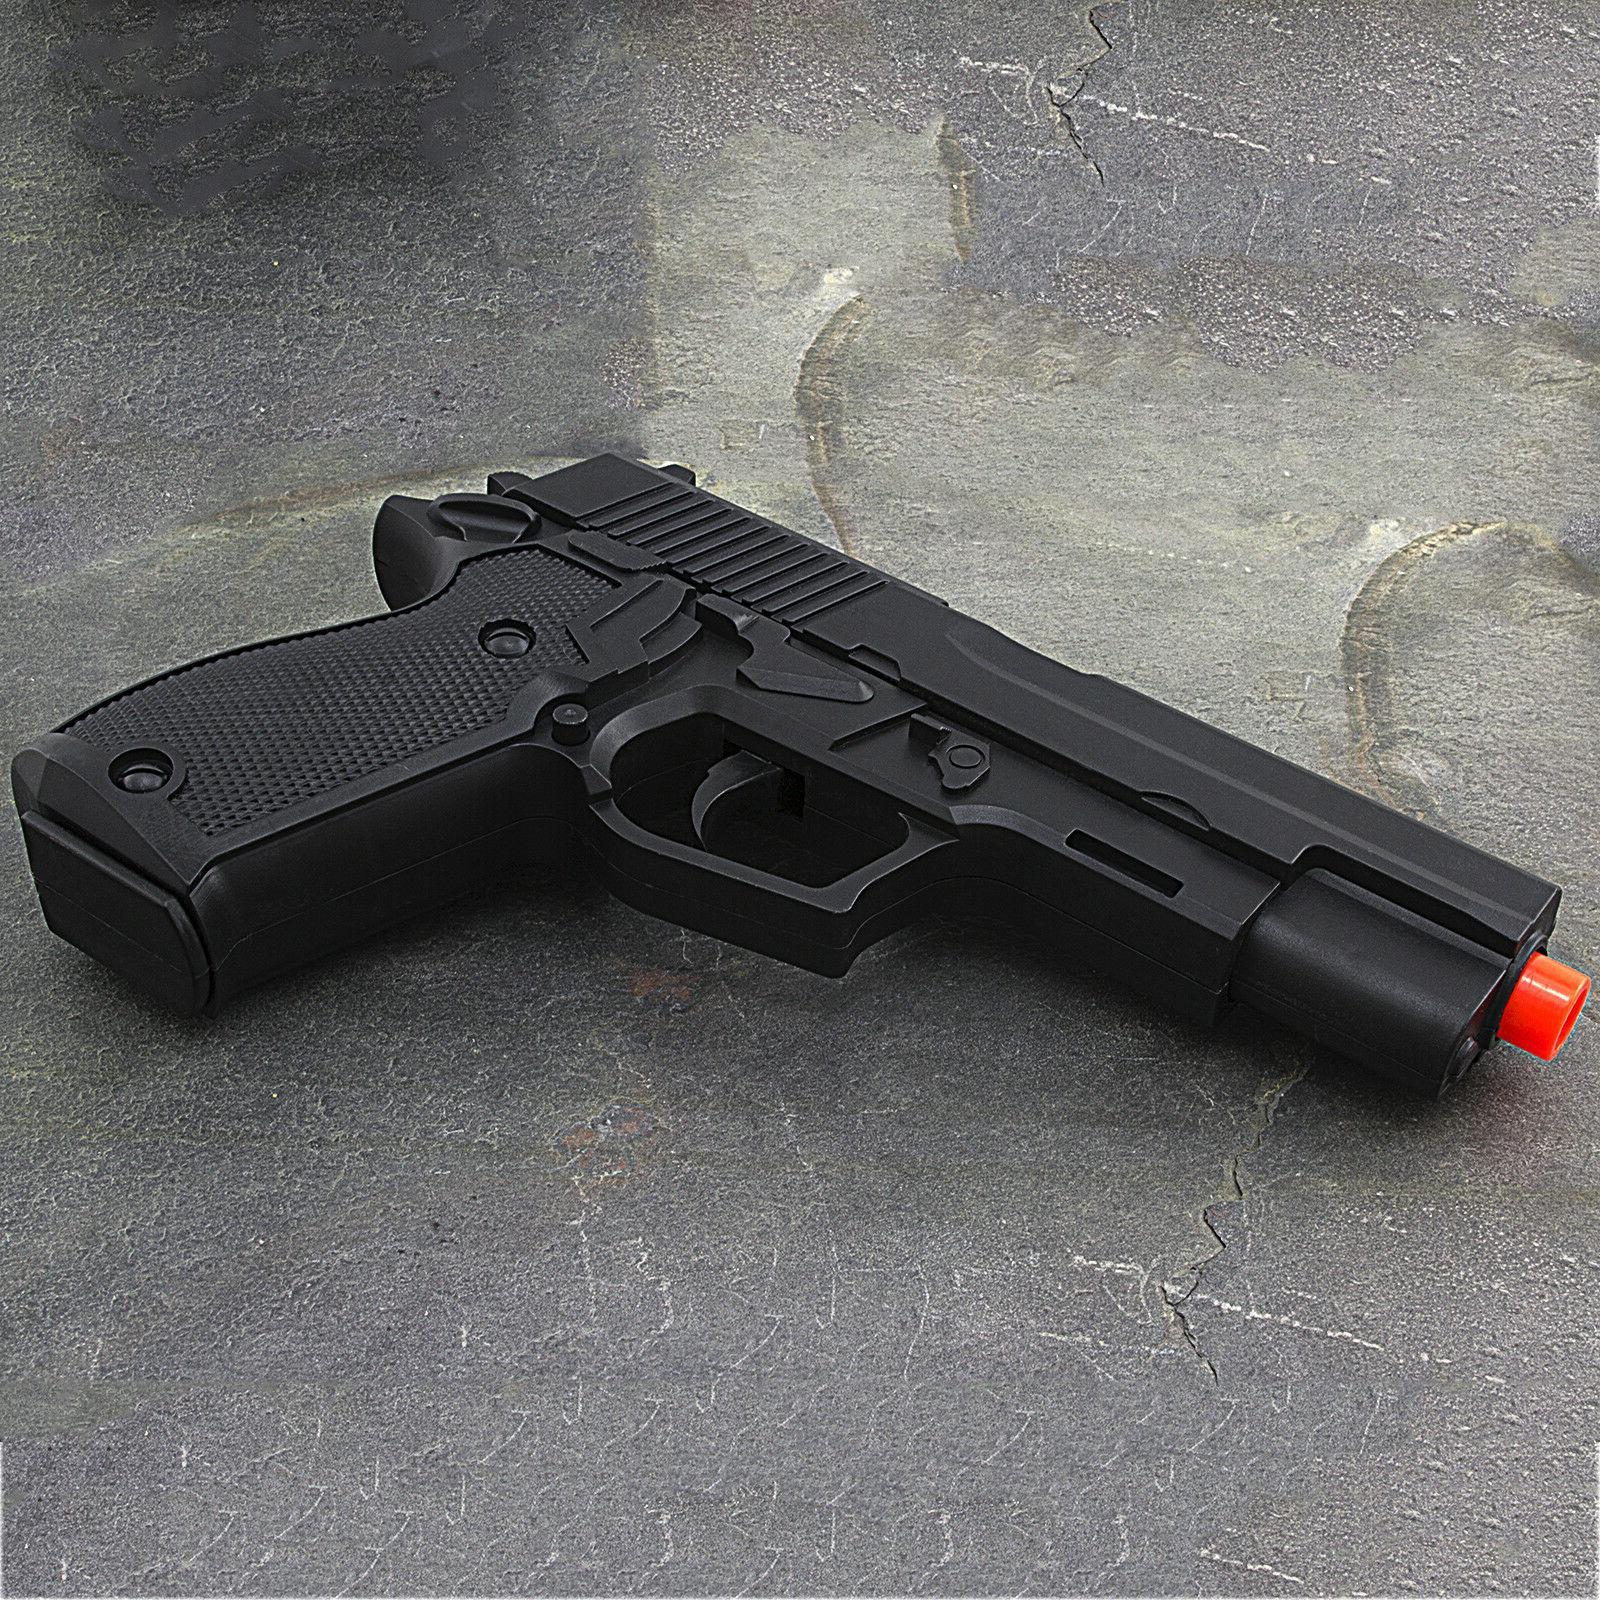 UKARMS SPRING HAND GUN PISTOL 6mm BB Black